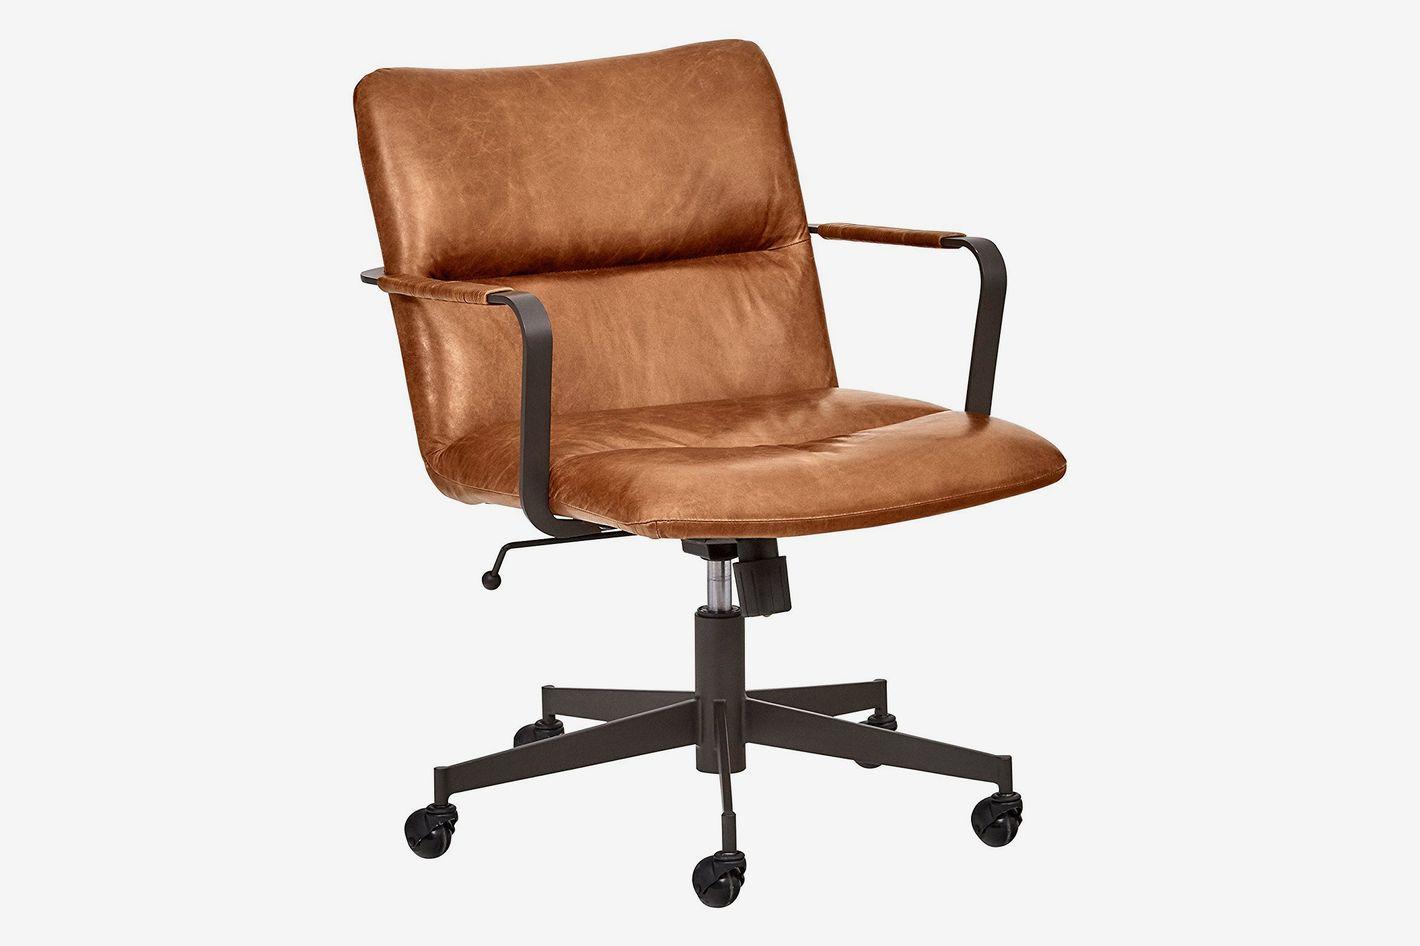 Rivet Mid-Century Leather Three-Panel Chair on Wheels